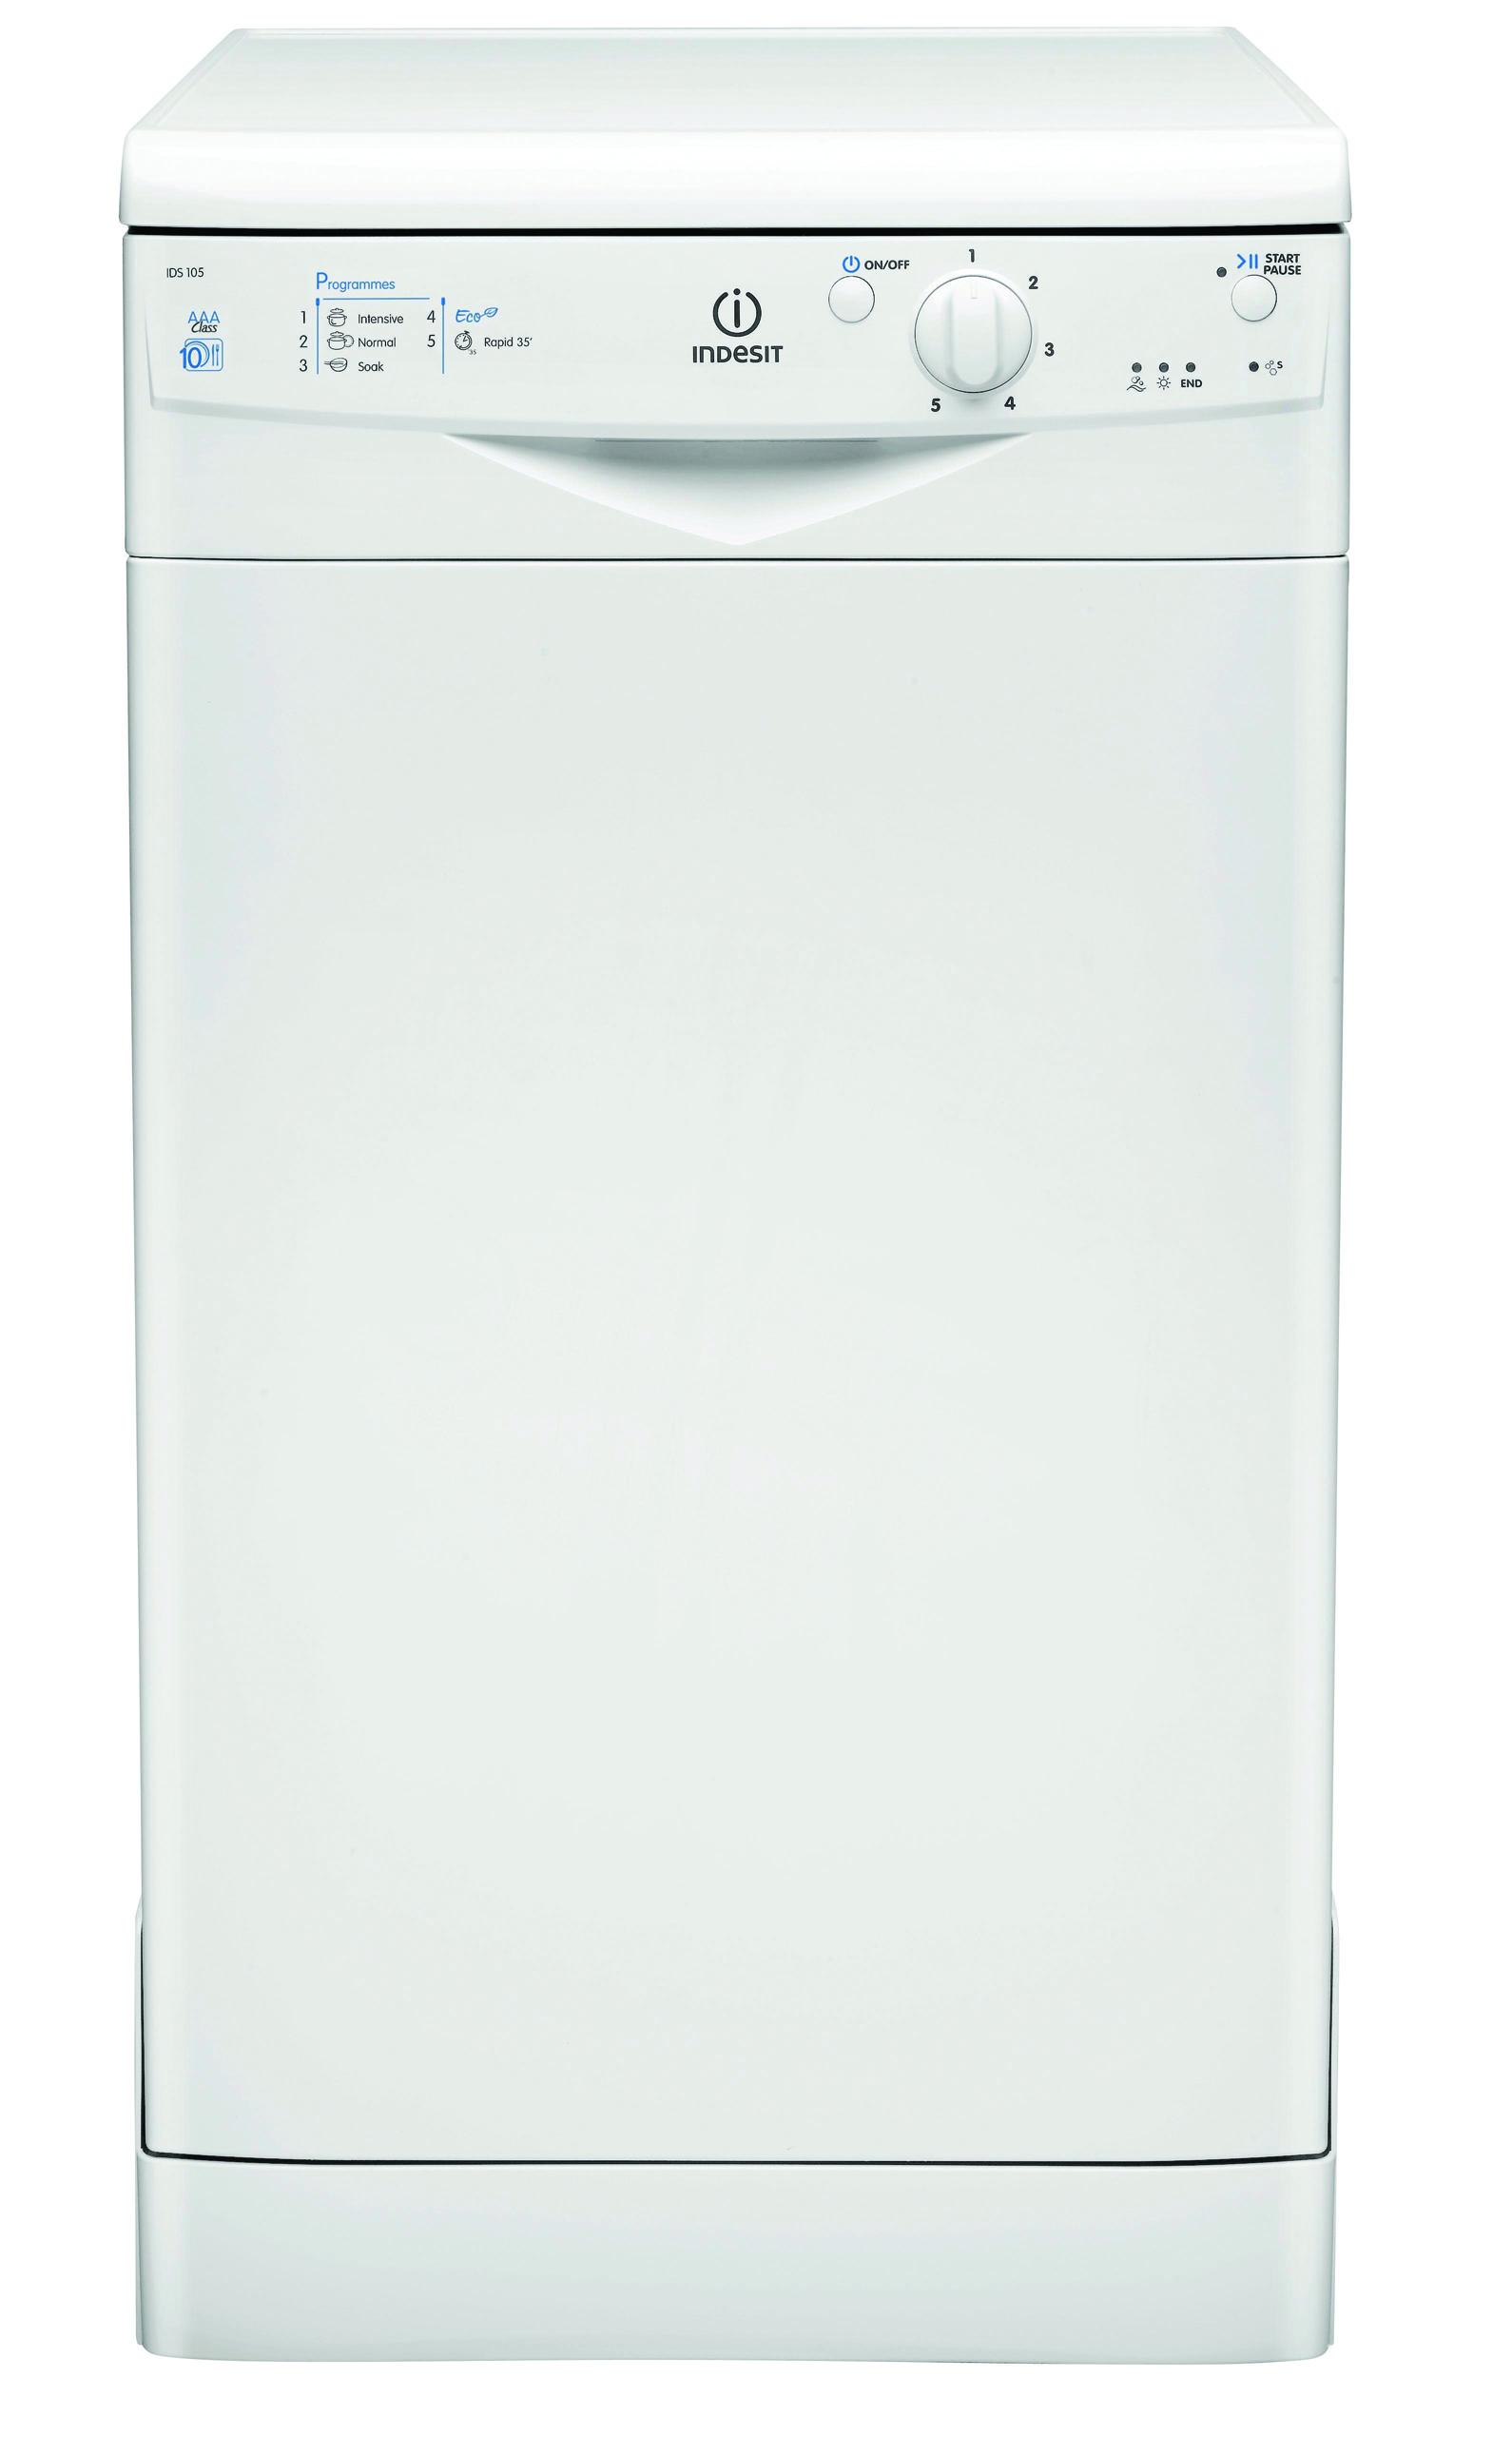 Buy Dishwashers In London Indesit Ids105 Dishwasher